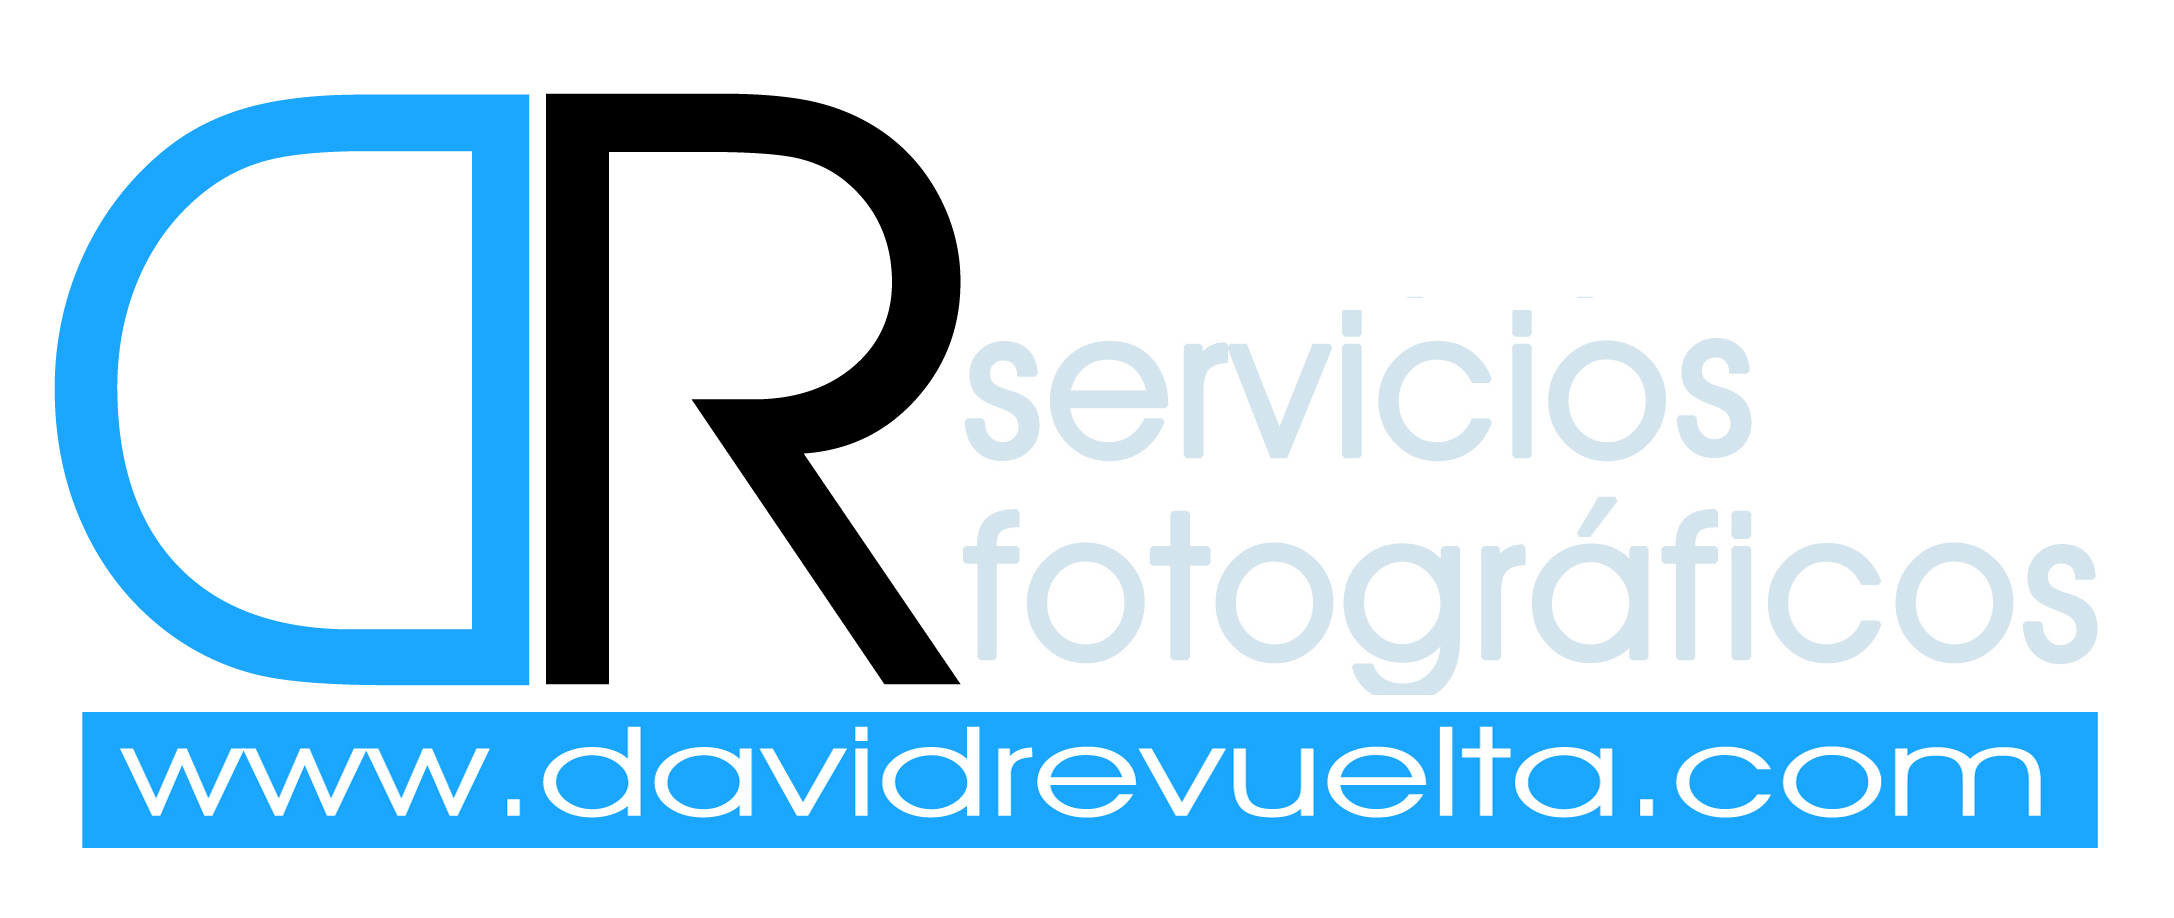 David Revuelta Fotografia